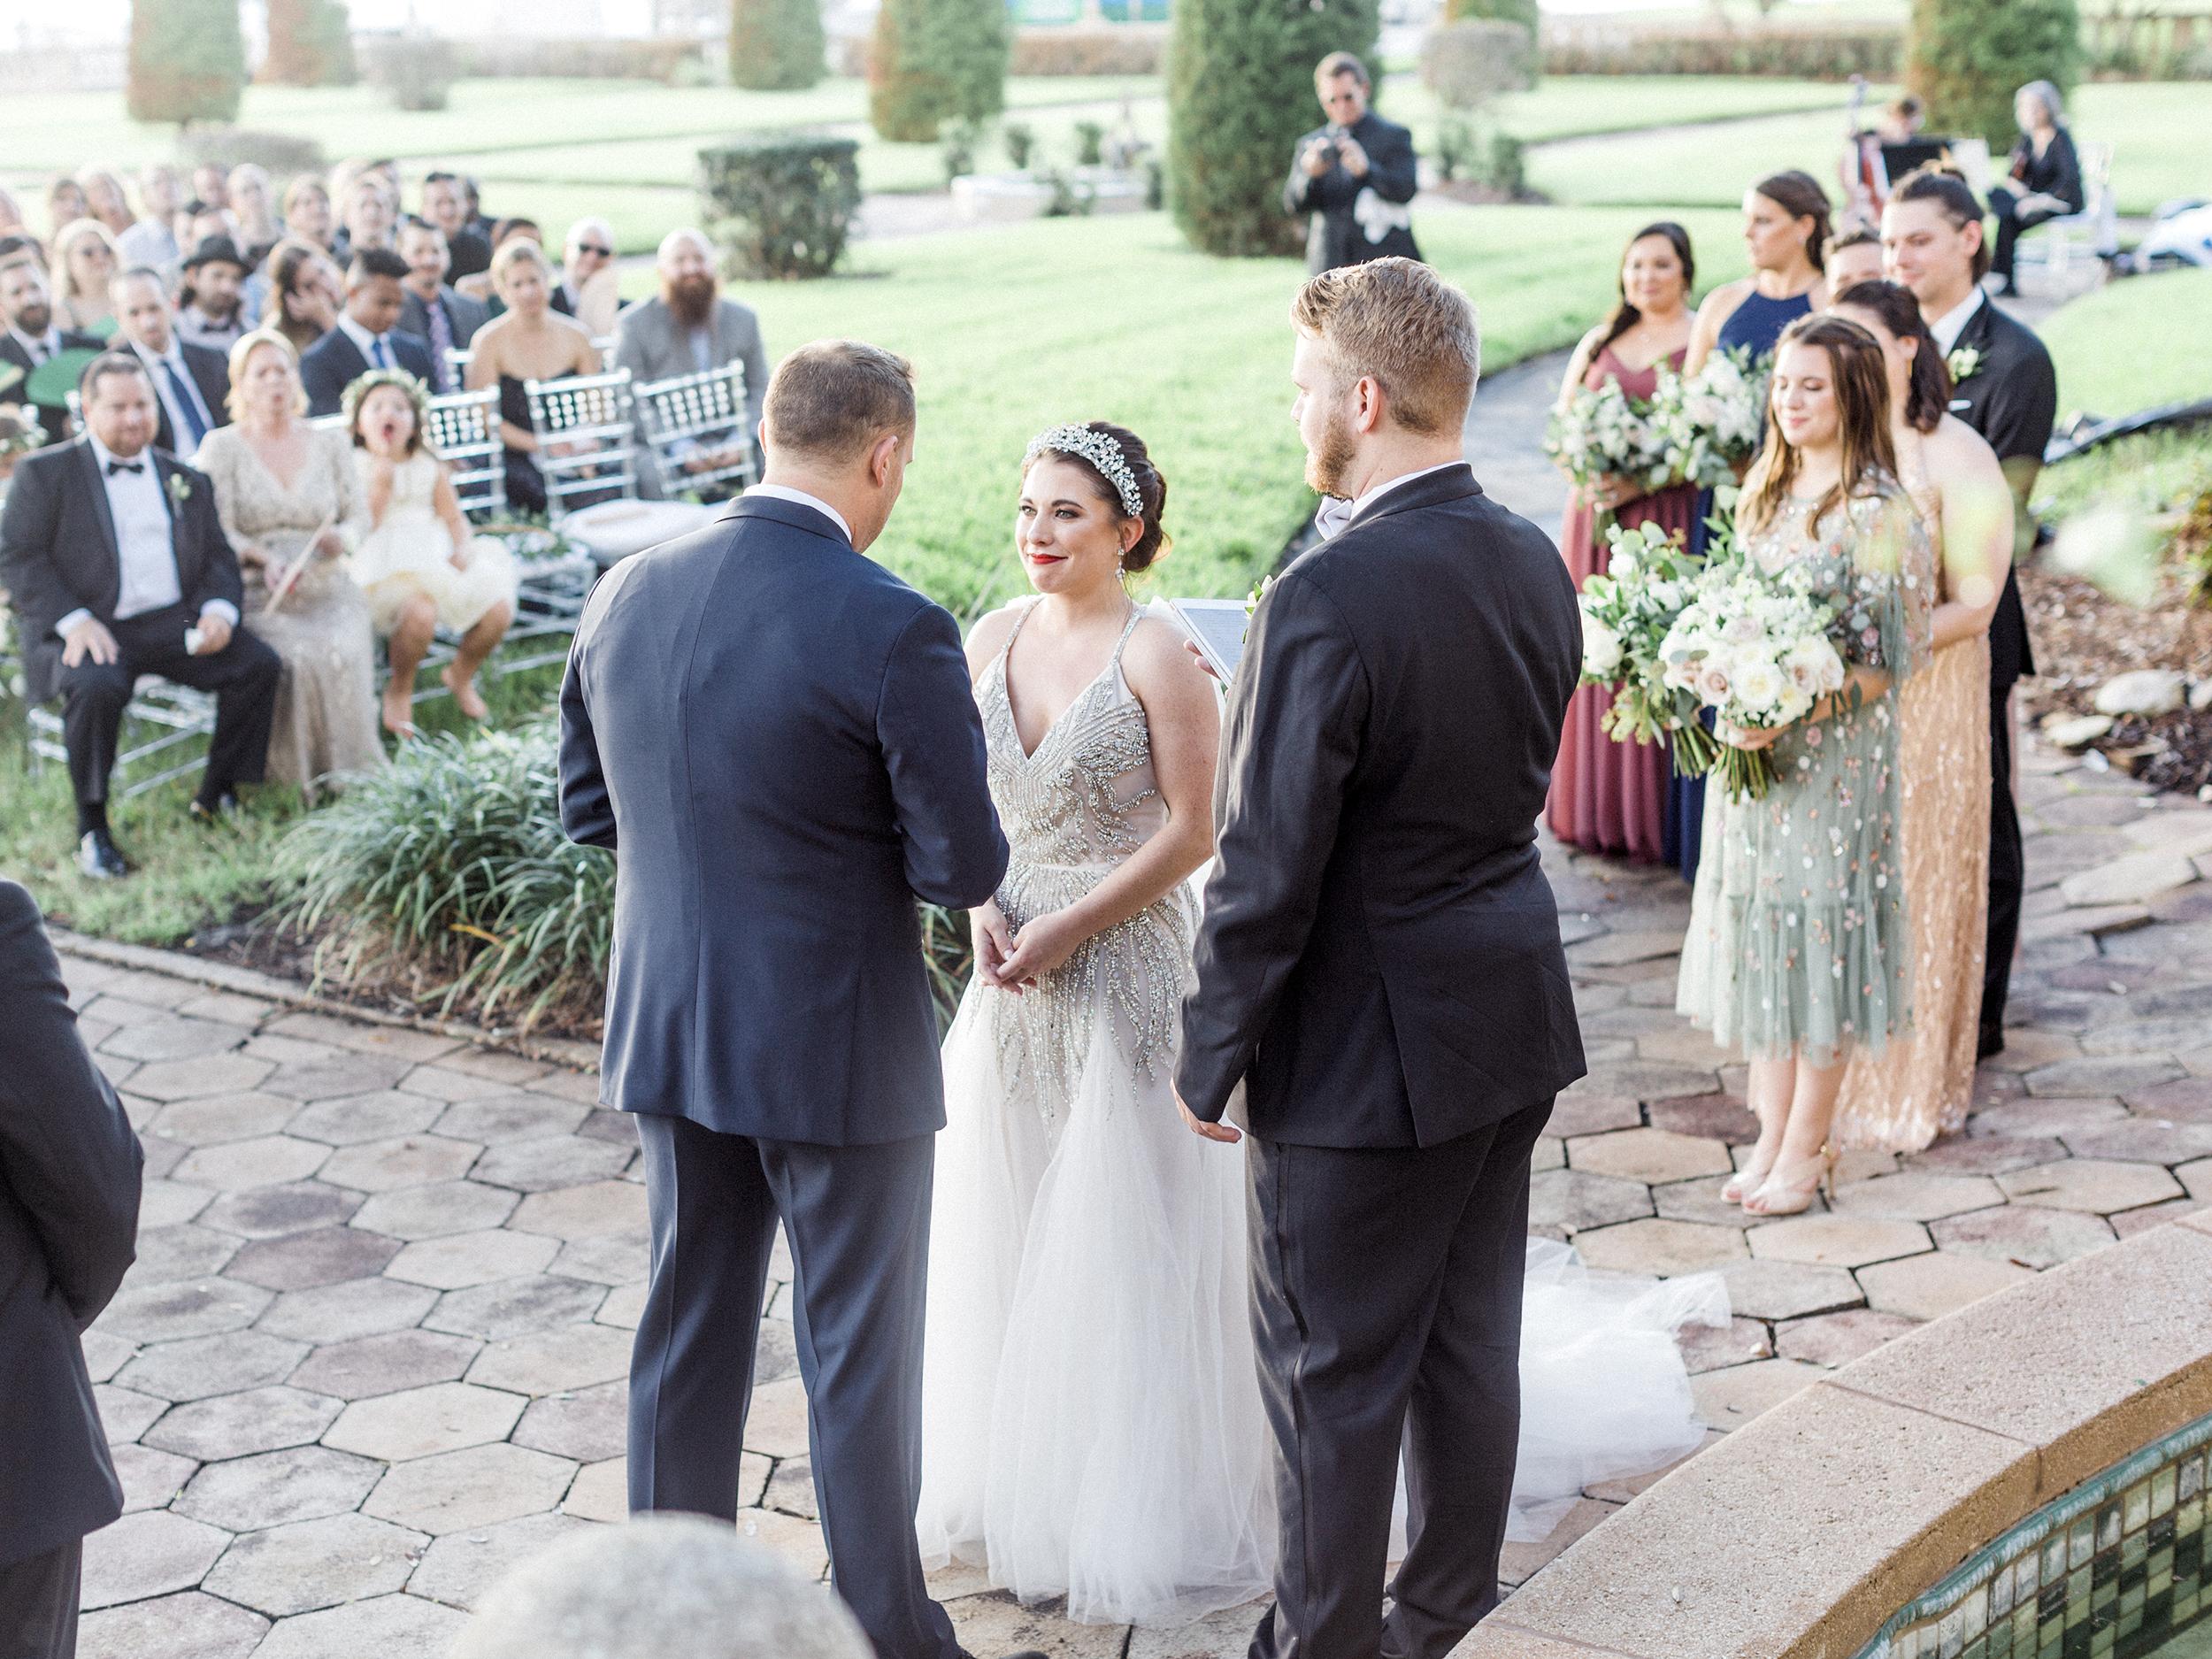 Lisa Silva Photography- Jacksonville, Florida Fine Art Film Wedding Photography Epping Forrest Yacht Club 41.jpg